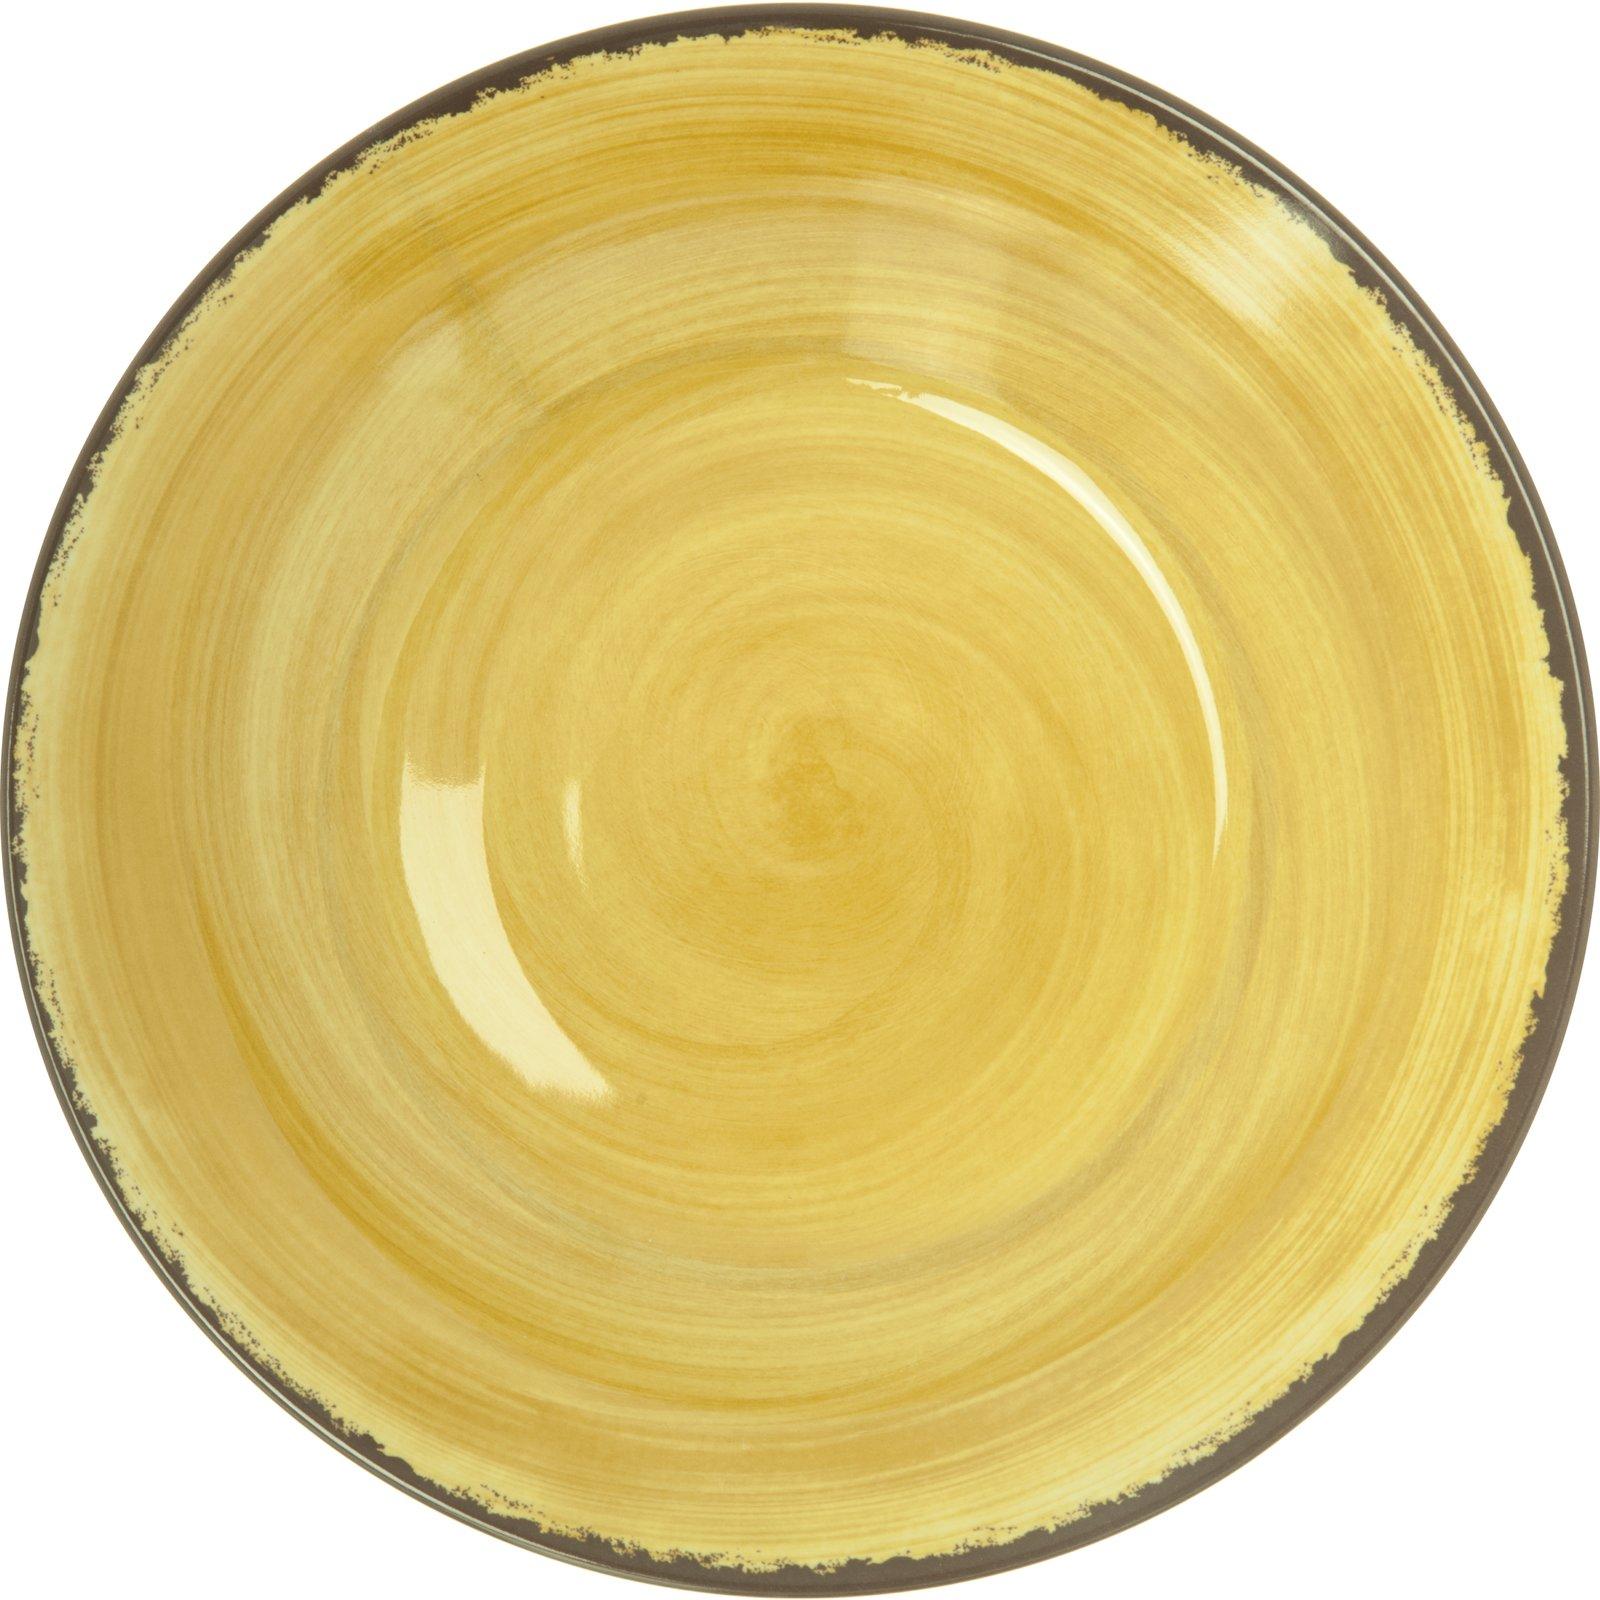 ... 5400313 - Mingle Melamine Rimmed Soup Bowl 28.5 oz - Amber  sc 1 st  Carlisle FoodService Products & 5400313 - Mingle Melamine Rimmed Soup Bowl 28.5 oz - Amber ...